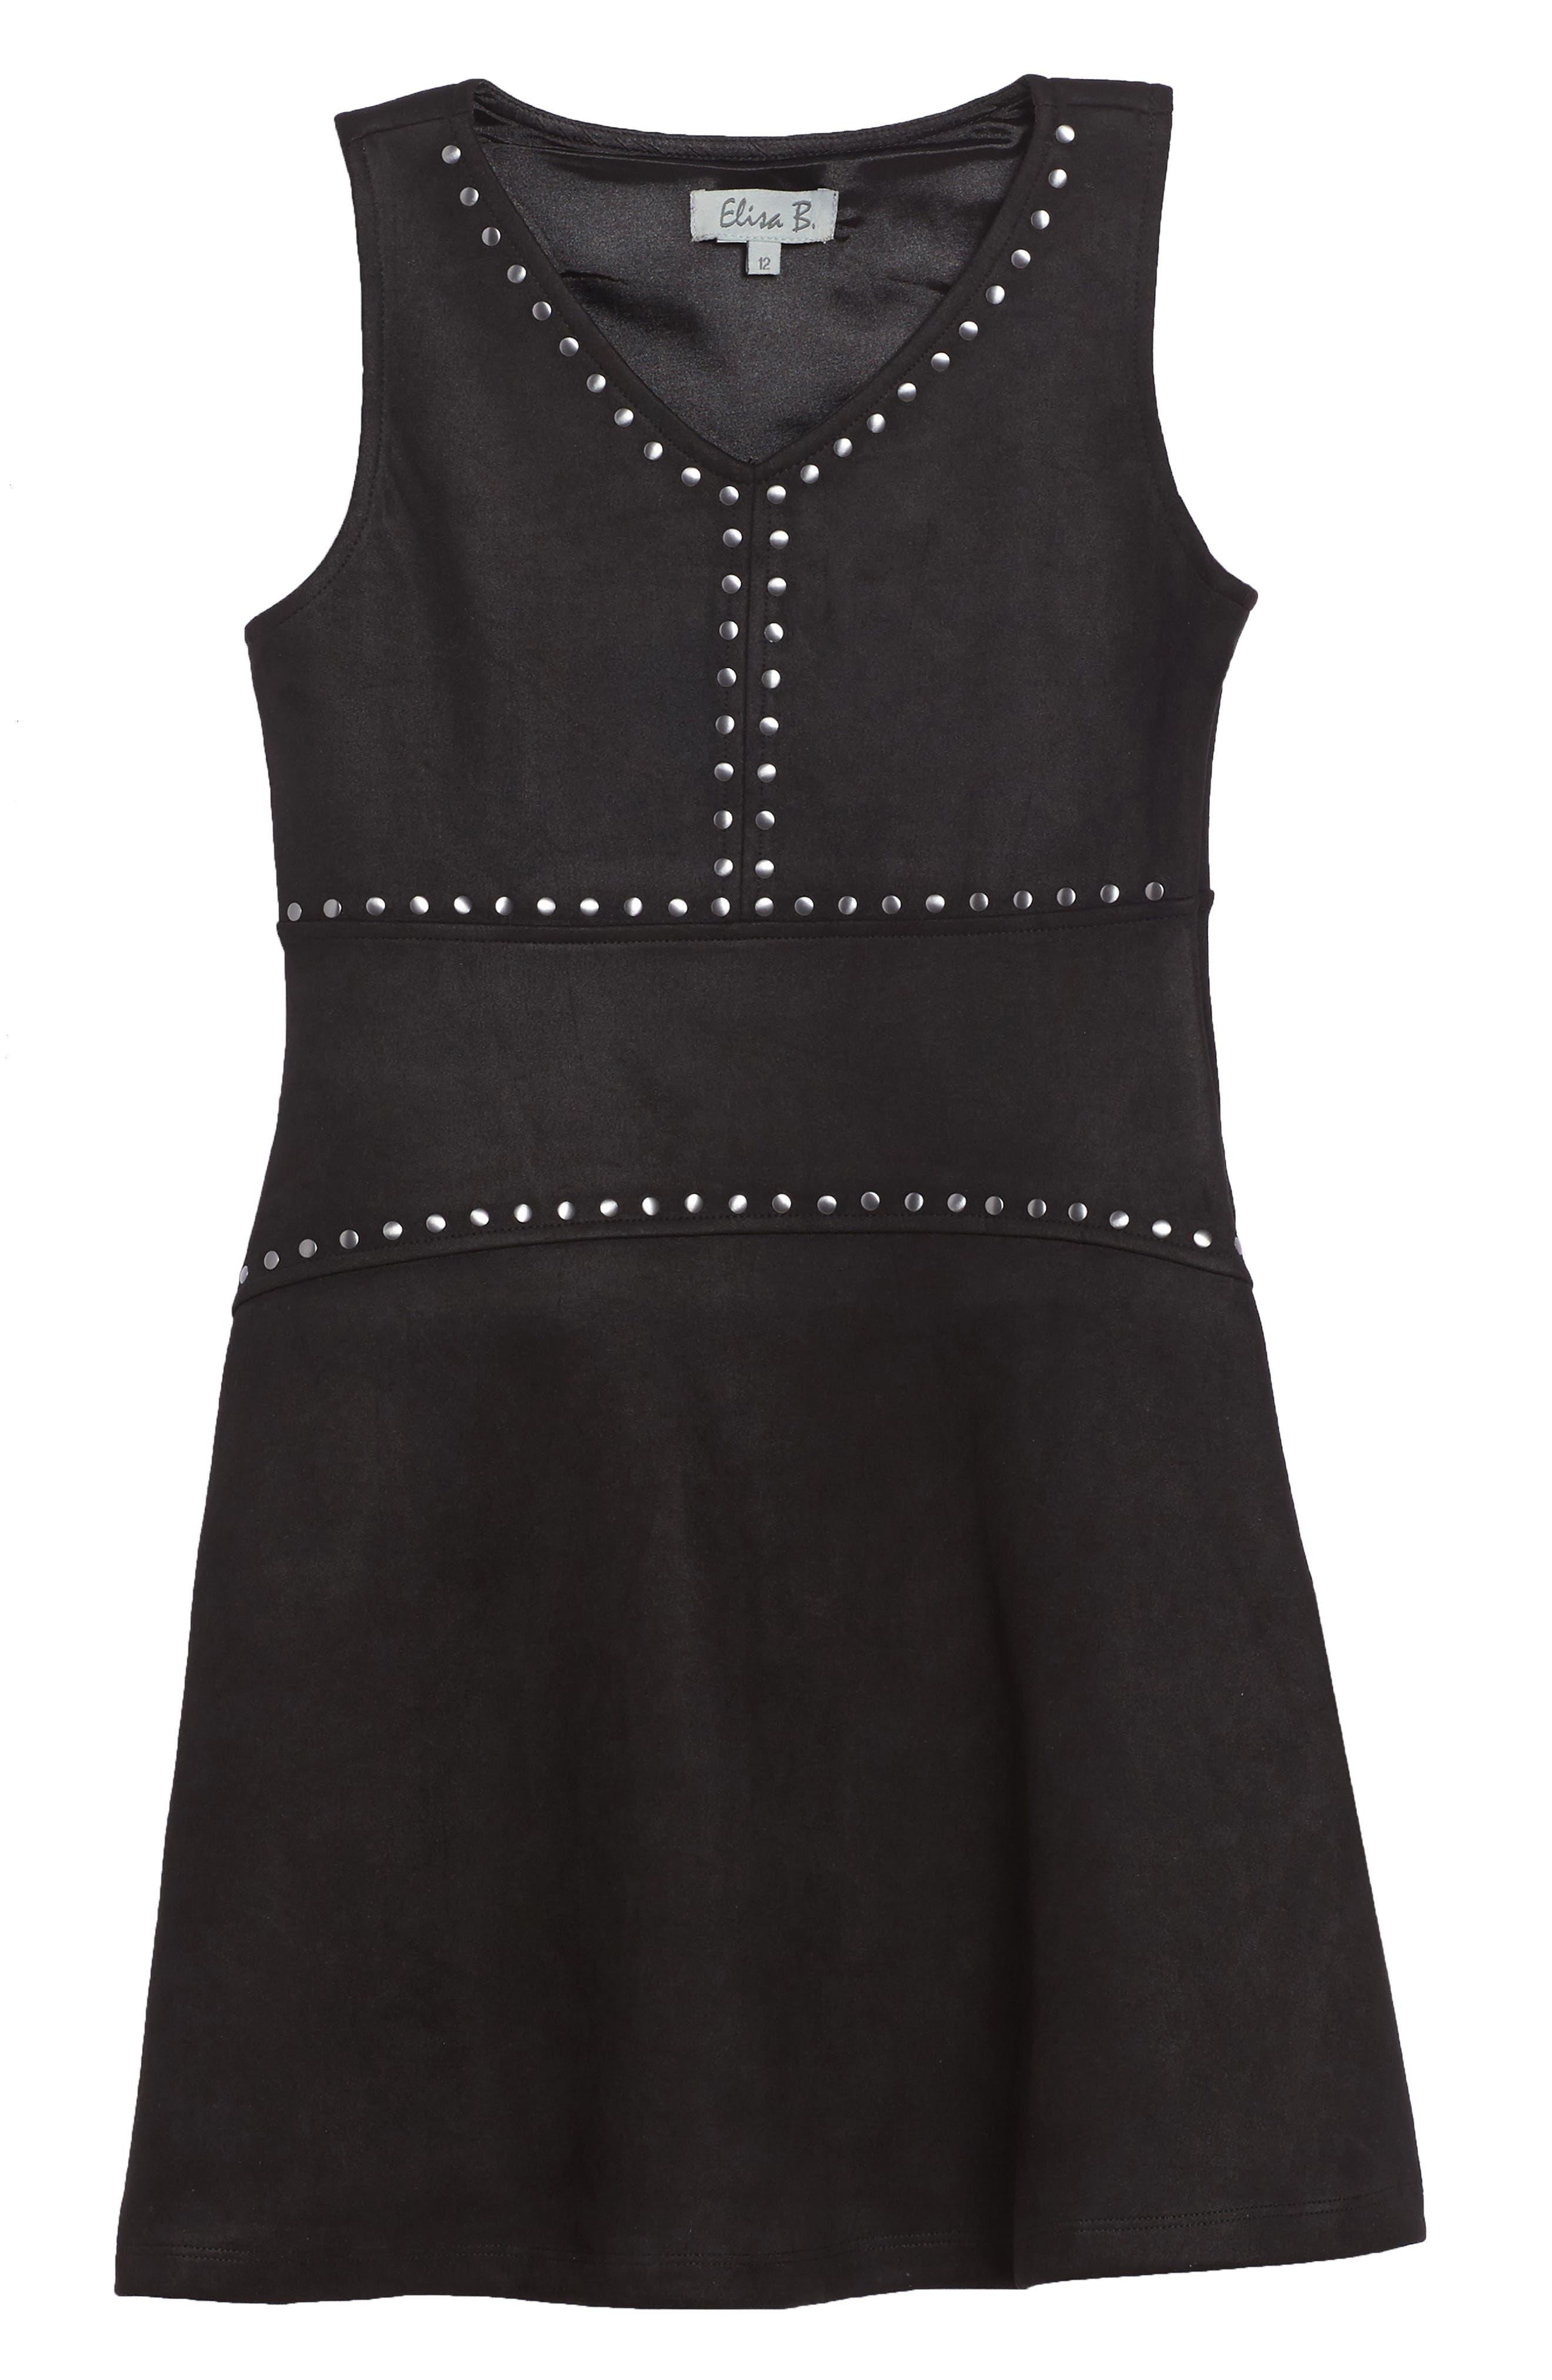 Elisa B Studded Sleeveless Dress (Big Girls)